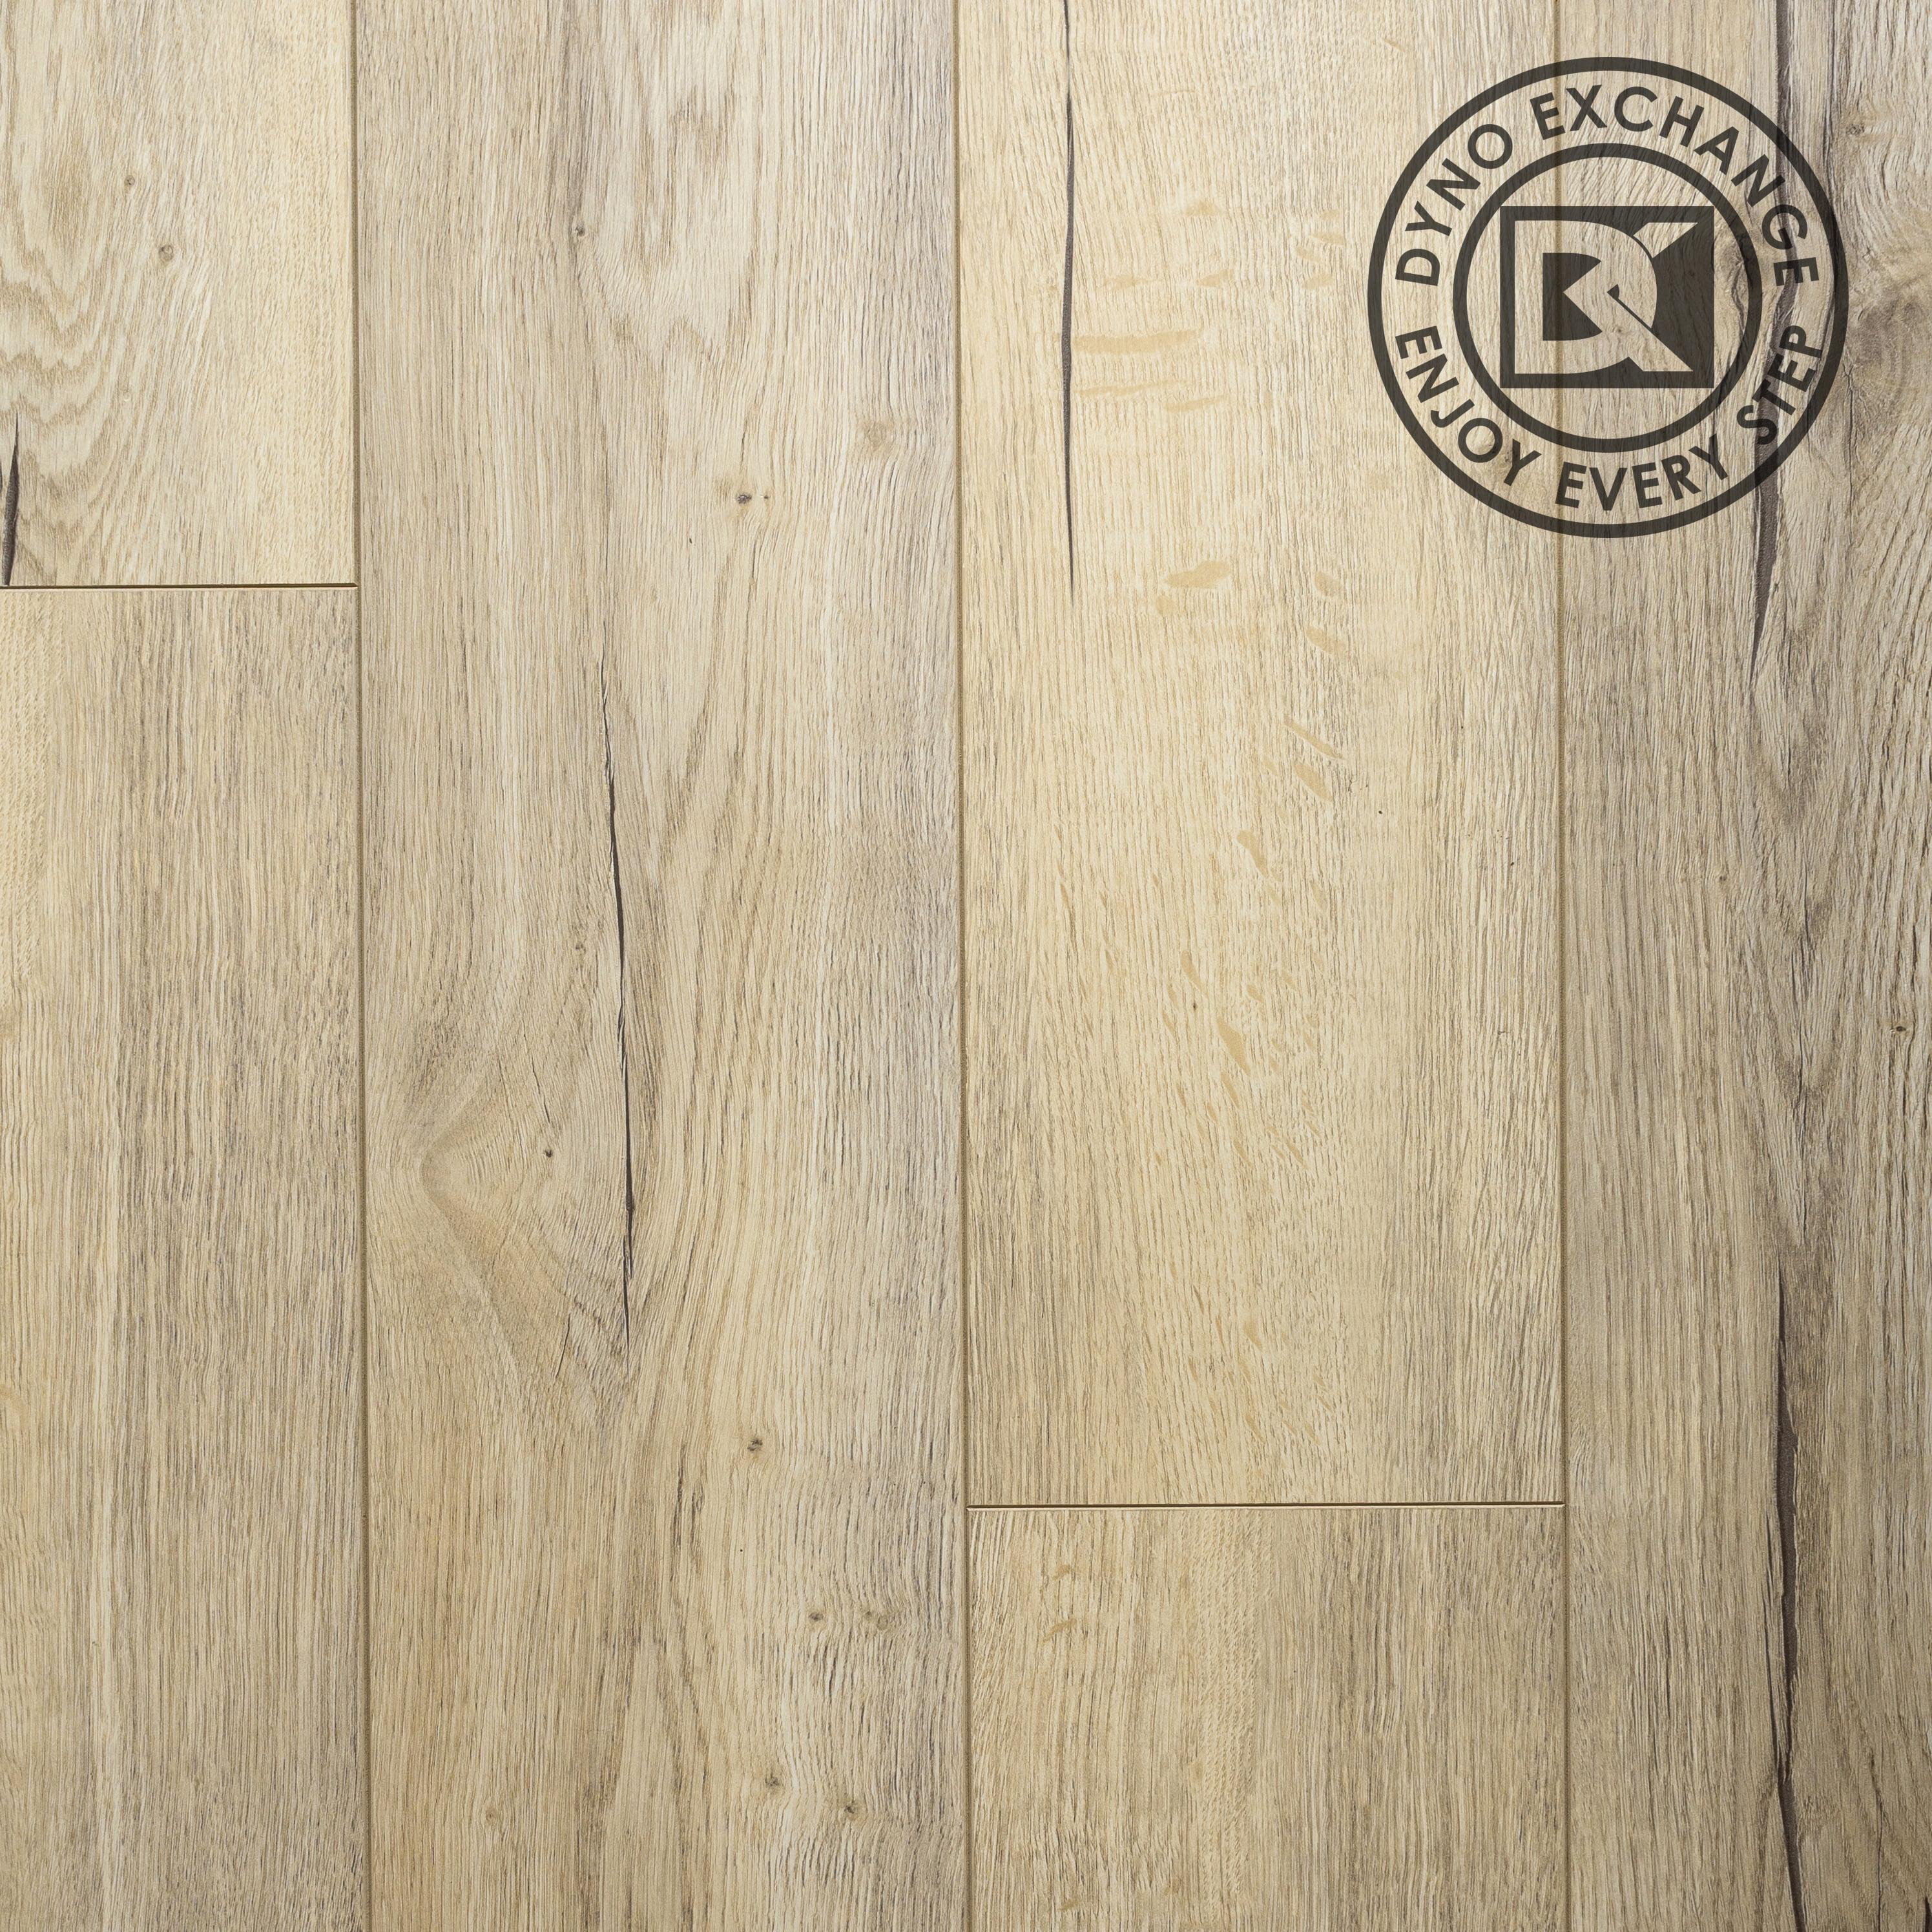 Dyno Exchange, EarthCare Collection Laminate Flooring, Milky Way (20.39 sqft/box)